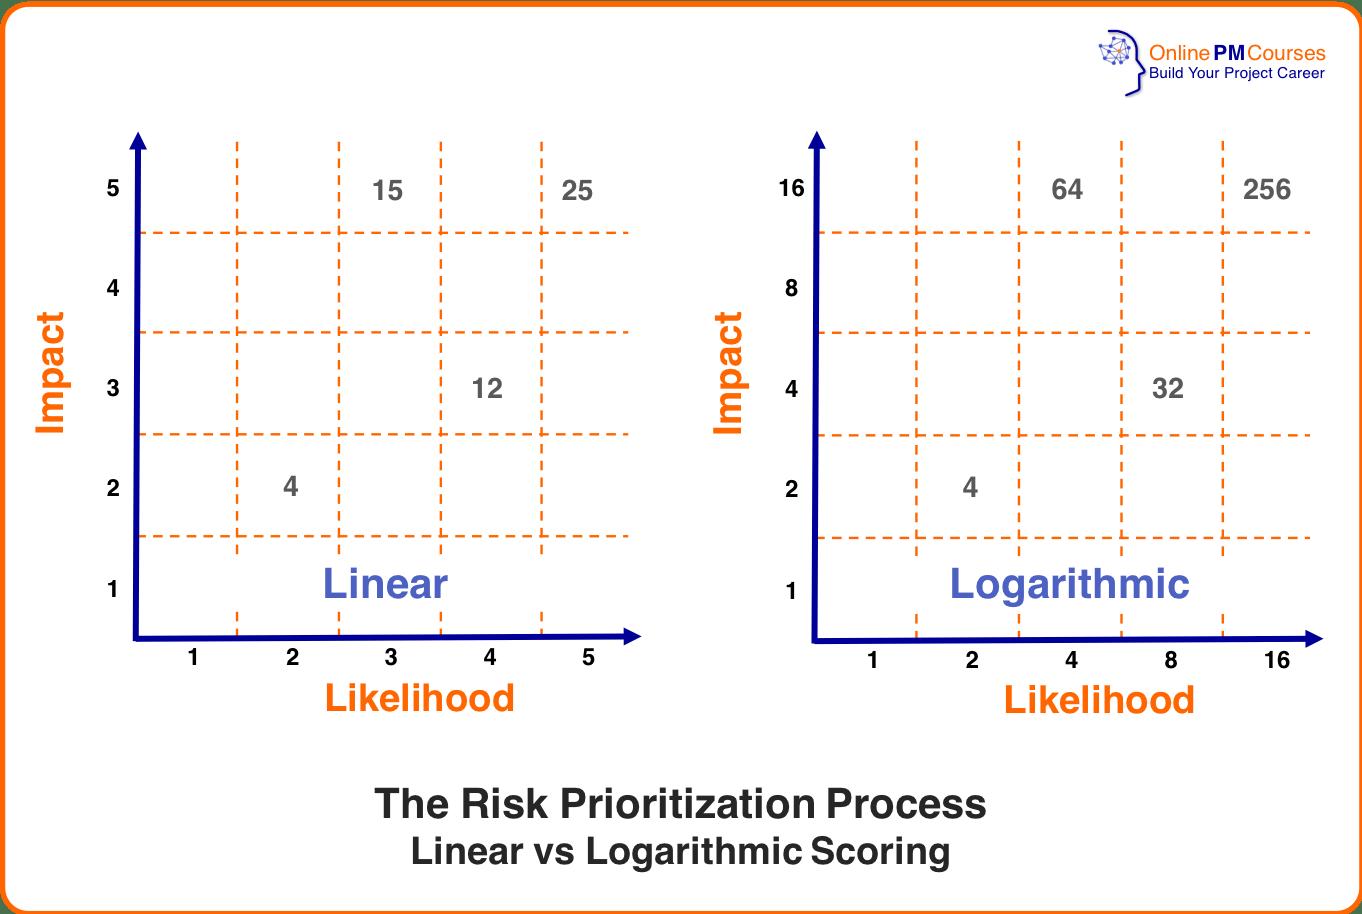 Risk Analysis - Risk Prioritization Process - Linear vs Logarithmis Scoring